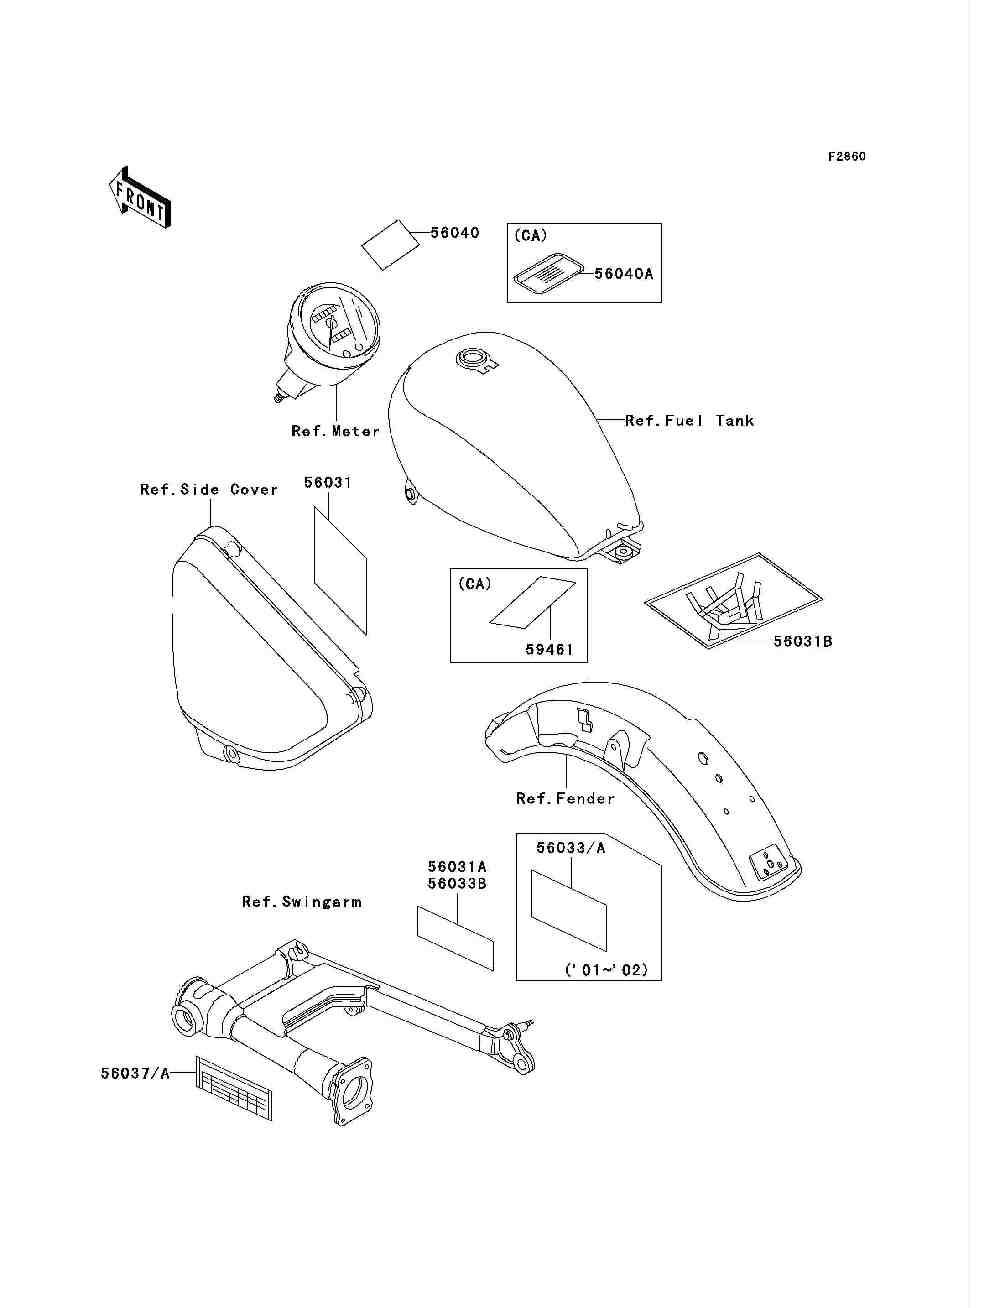 Parts Finder 2001 Kawasaki Motorcycles Vanderzee Motorplex In Vn750 Headlight Wiring Diagram South Haven Mi